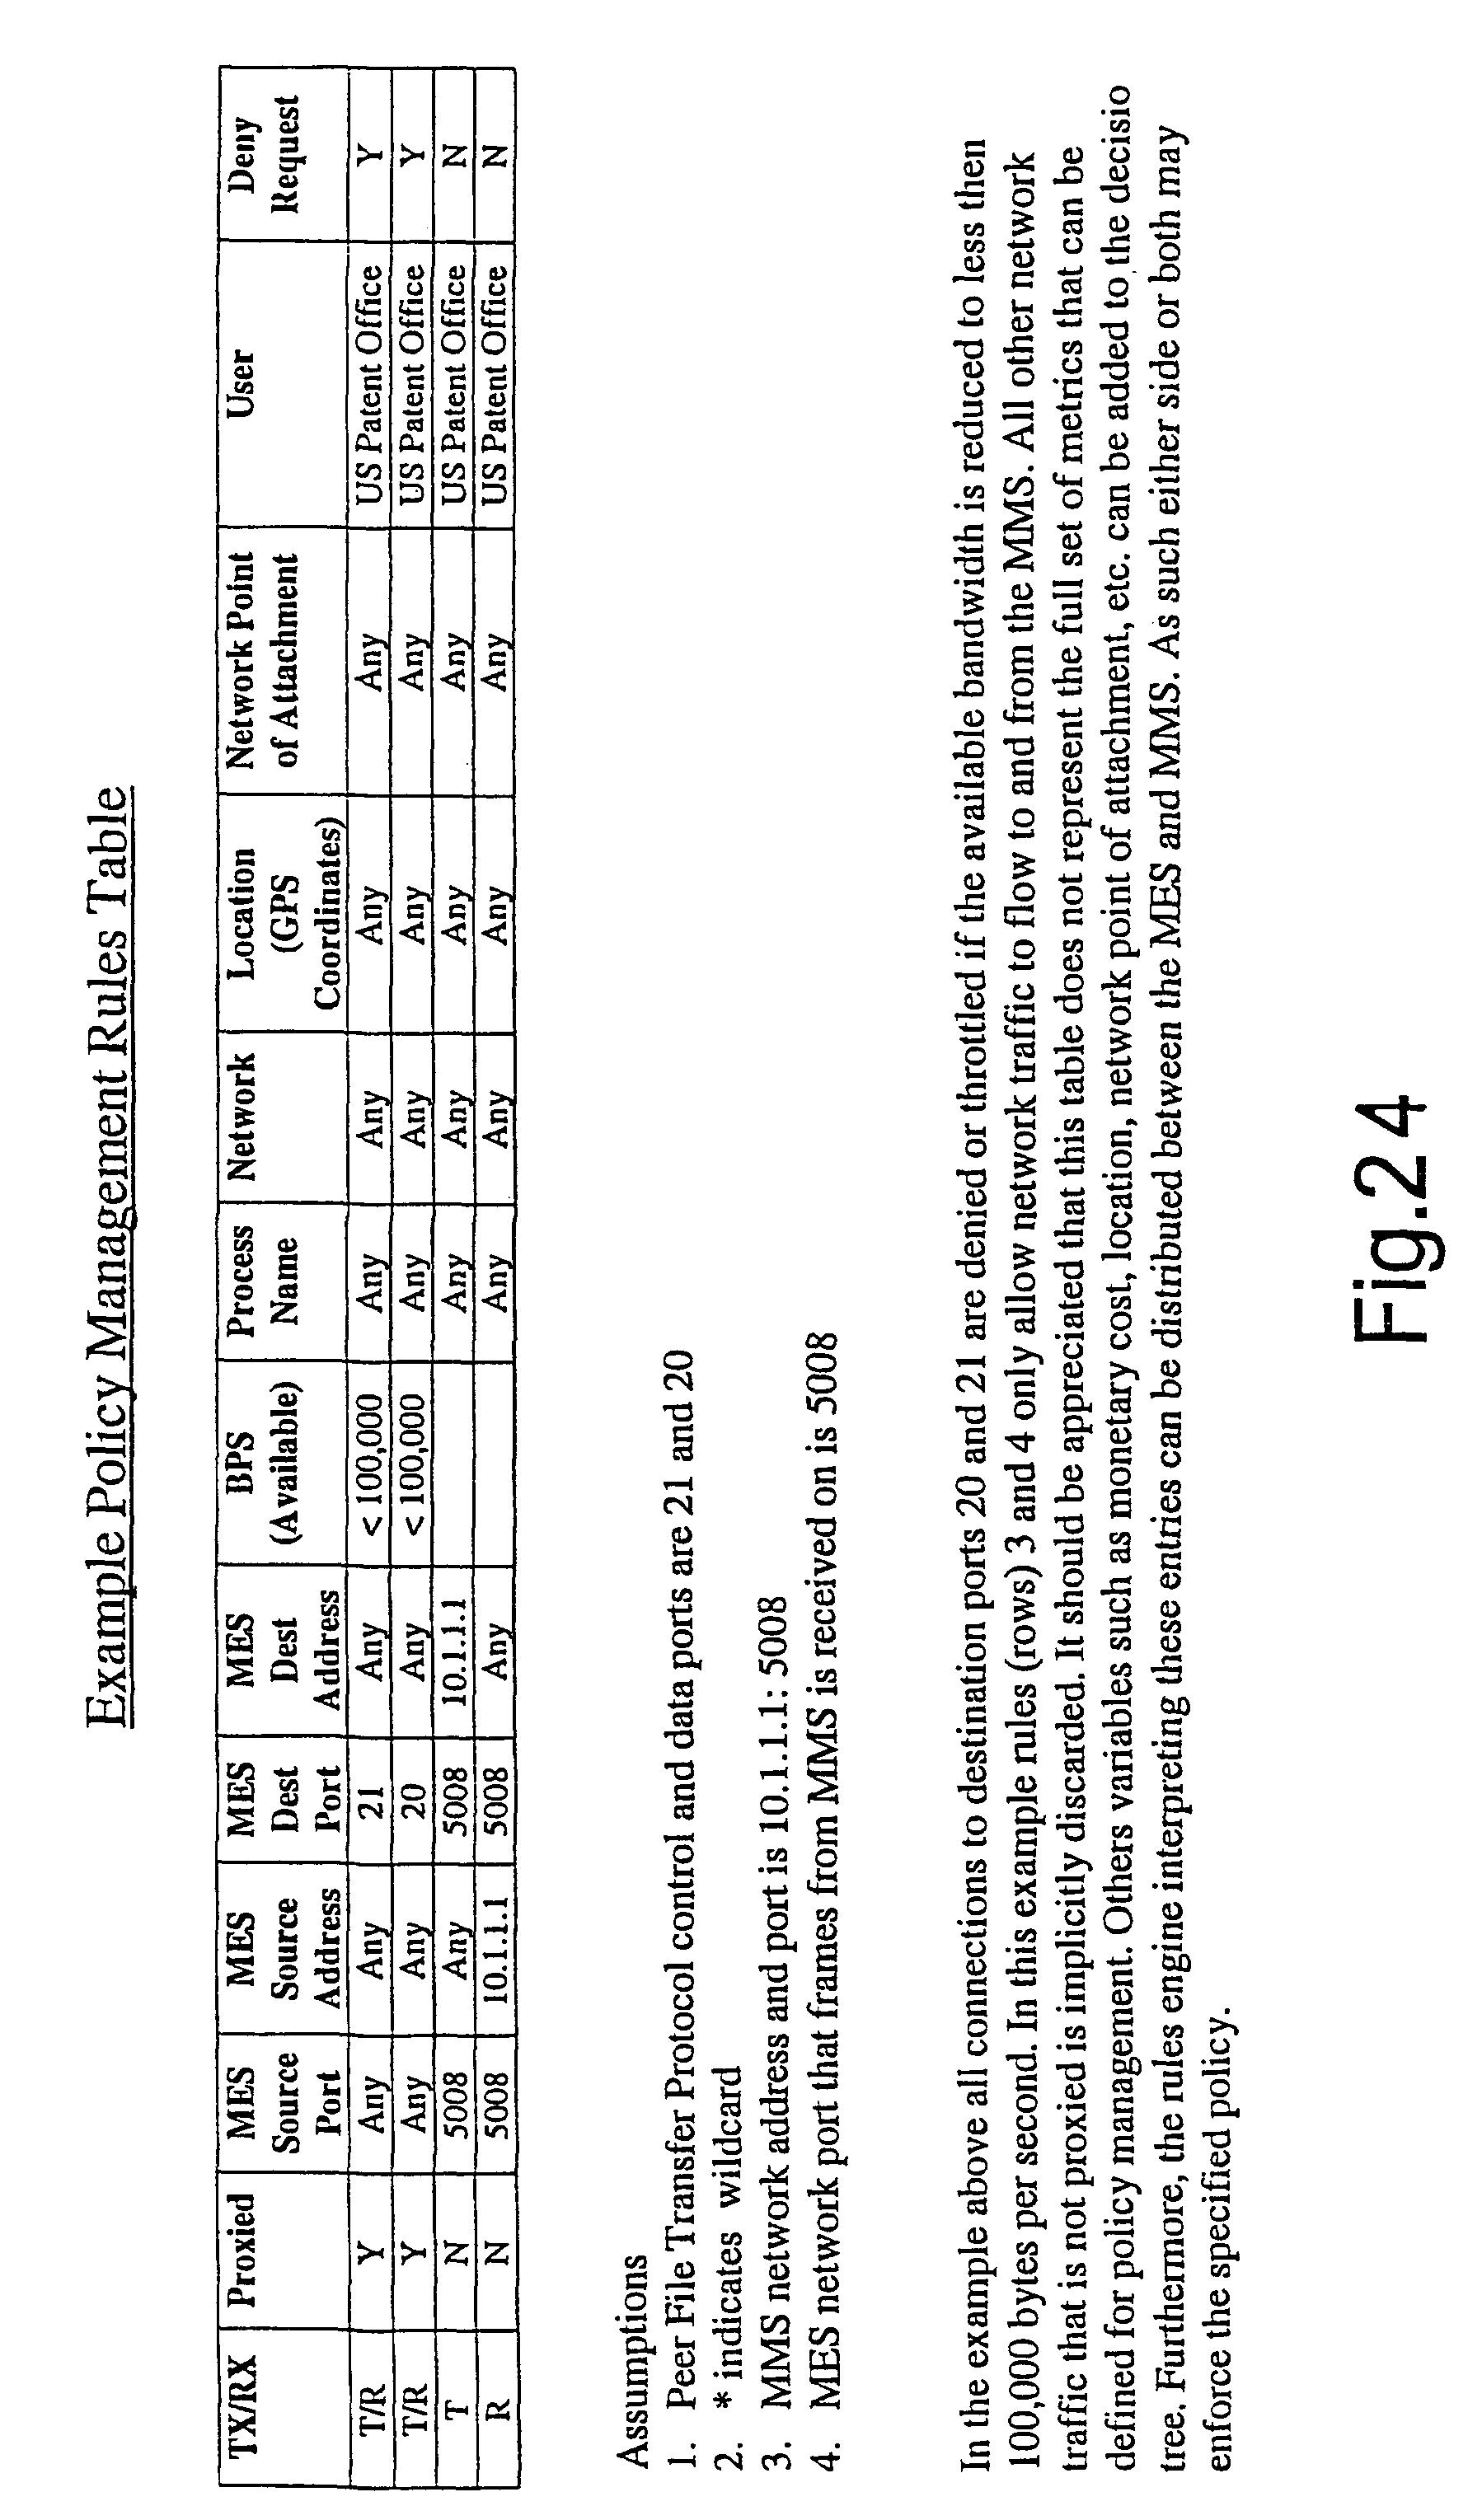 Patent US 7,778,260 B2